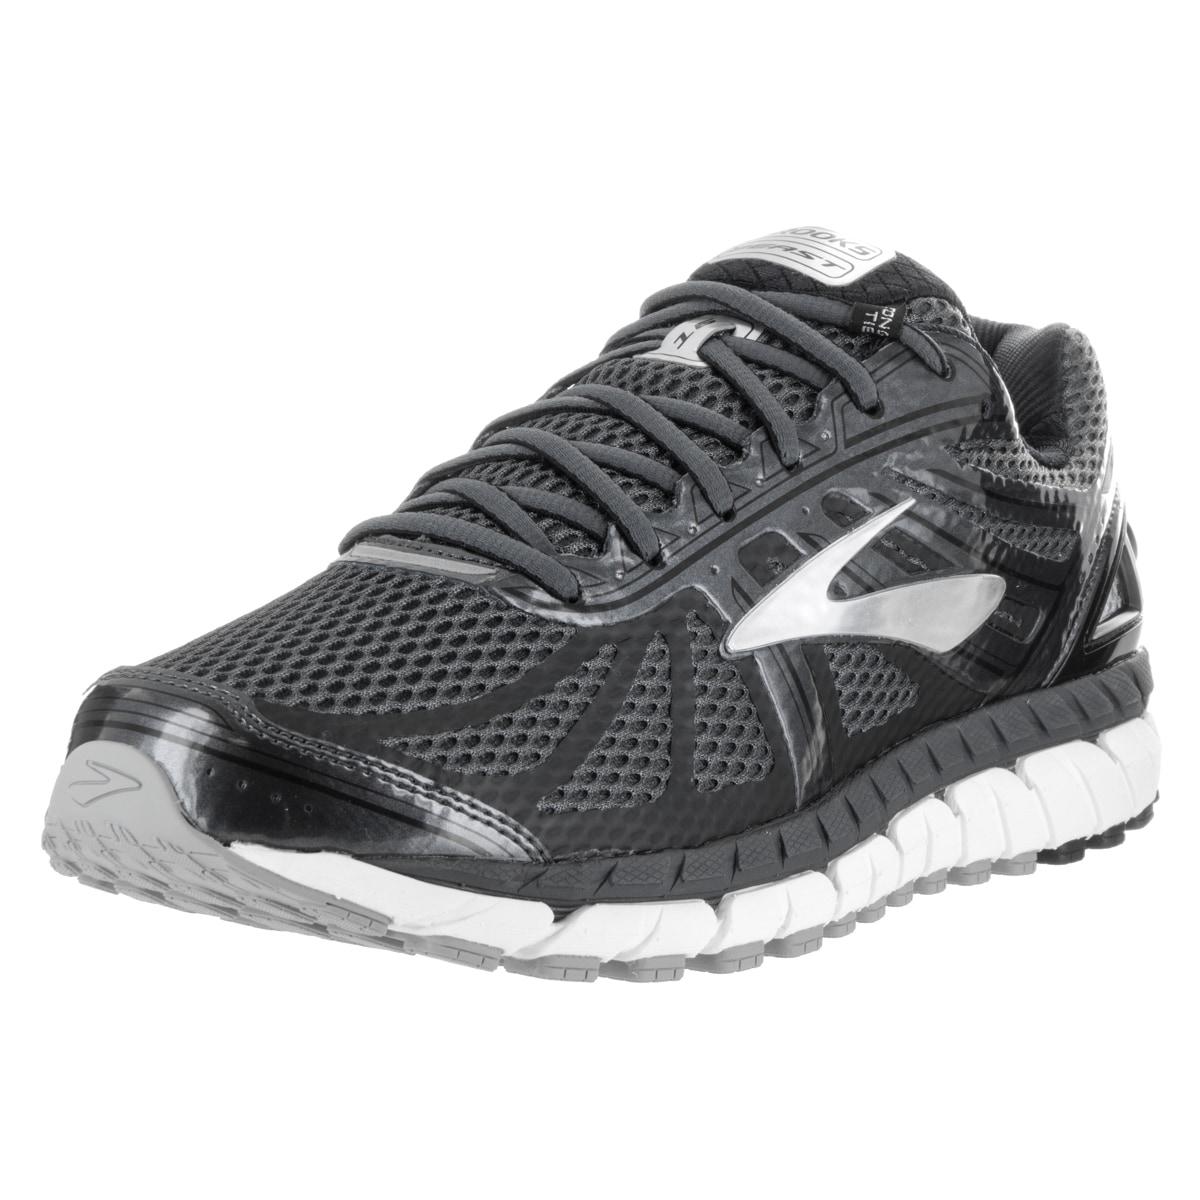 BROOKS Men's Beast '16 Black Running Shoes (9)